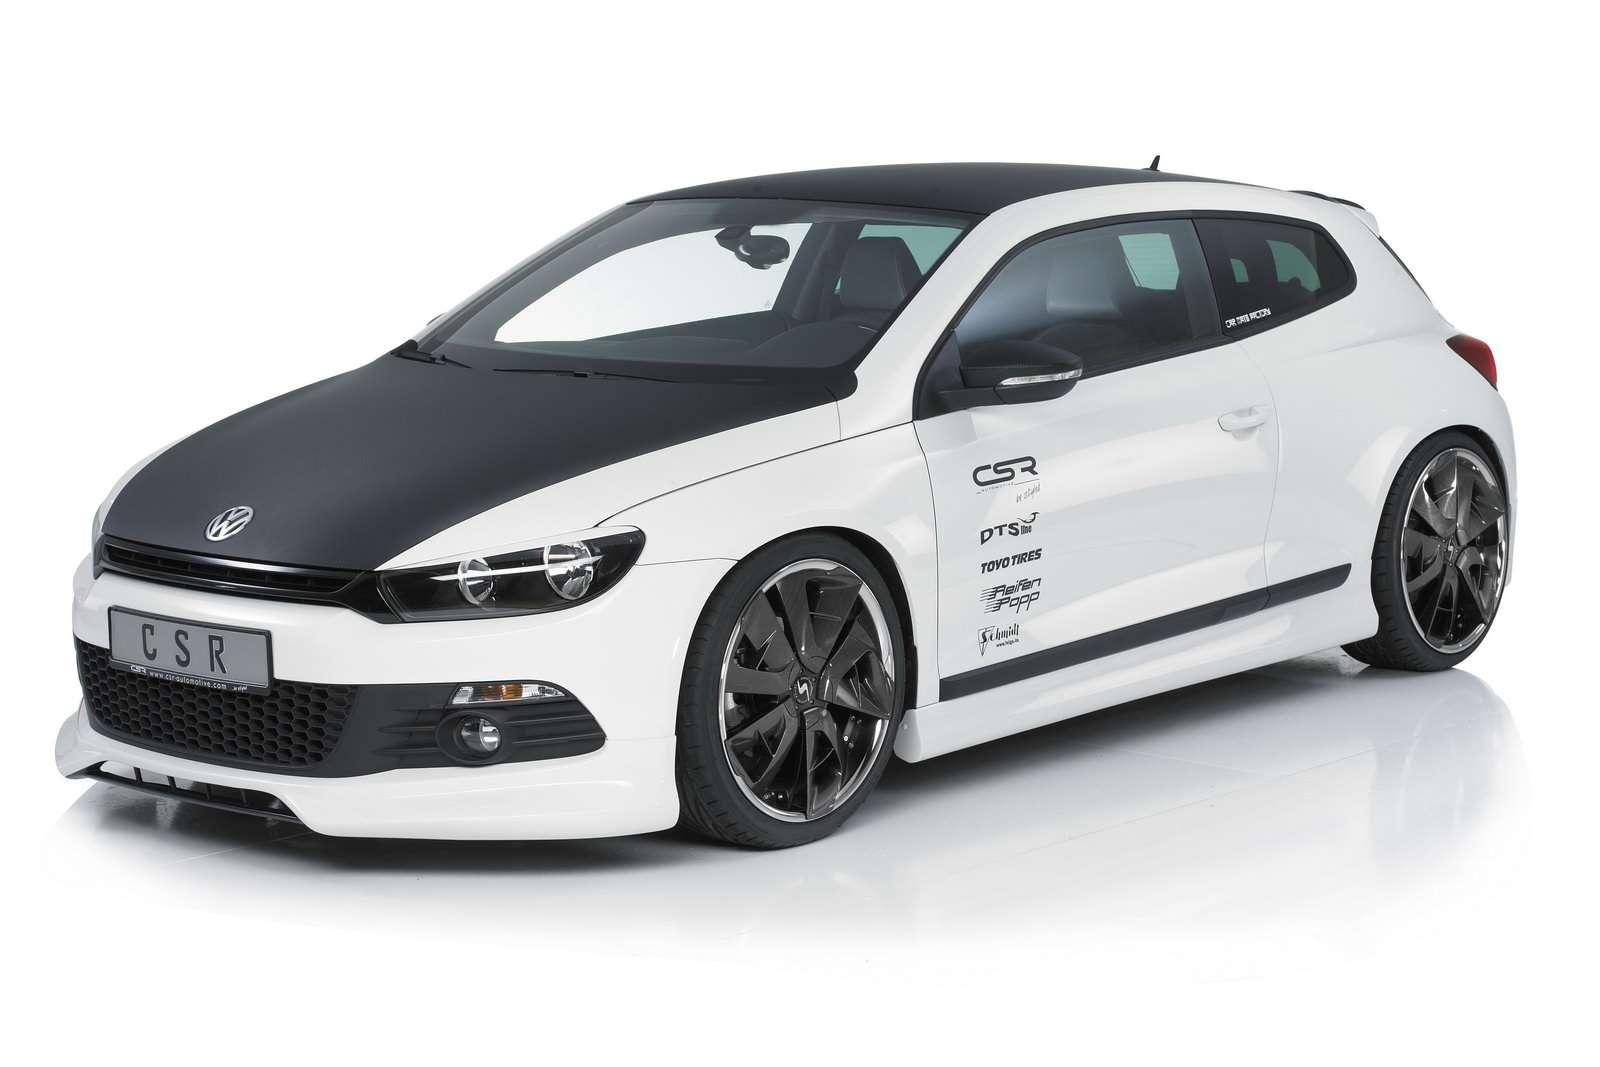 VW Scirocco CSR Automotive marzec 2011